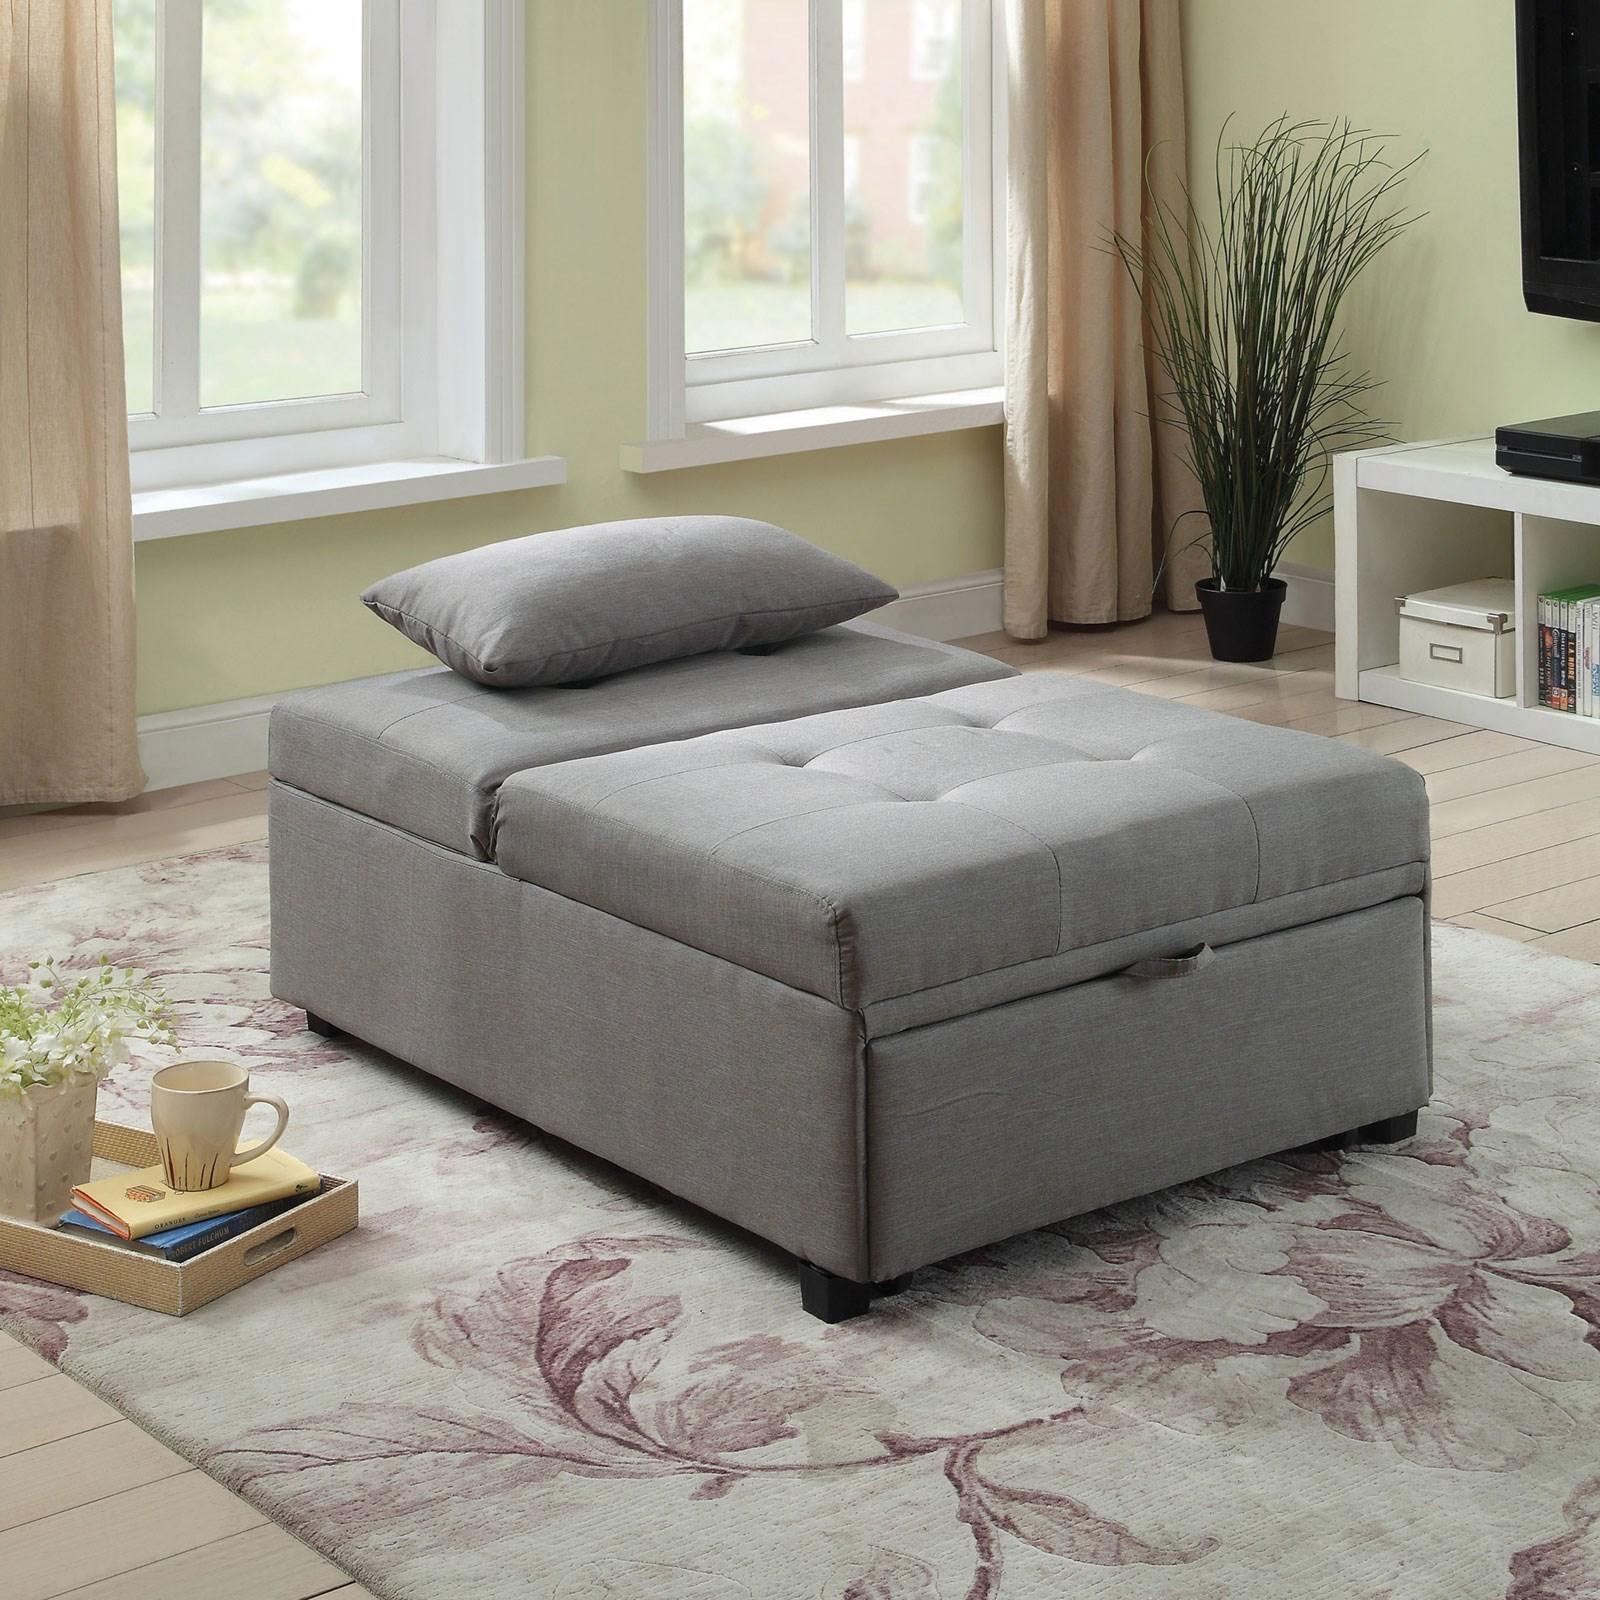 Oona Futon Sofa at Household Furniture